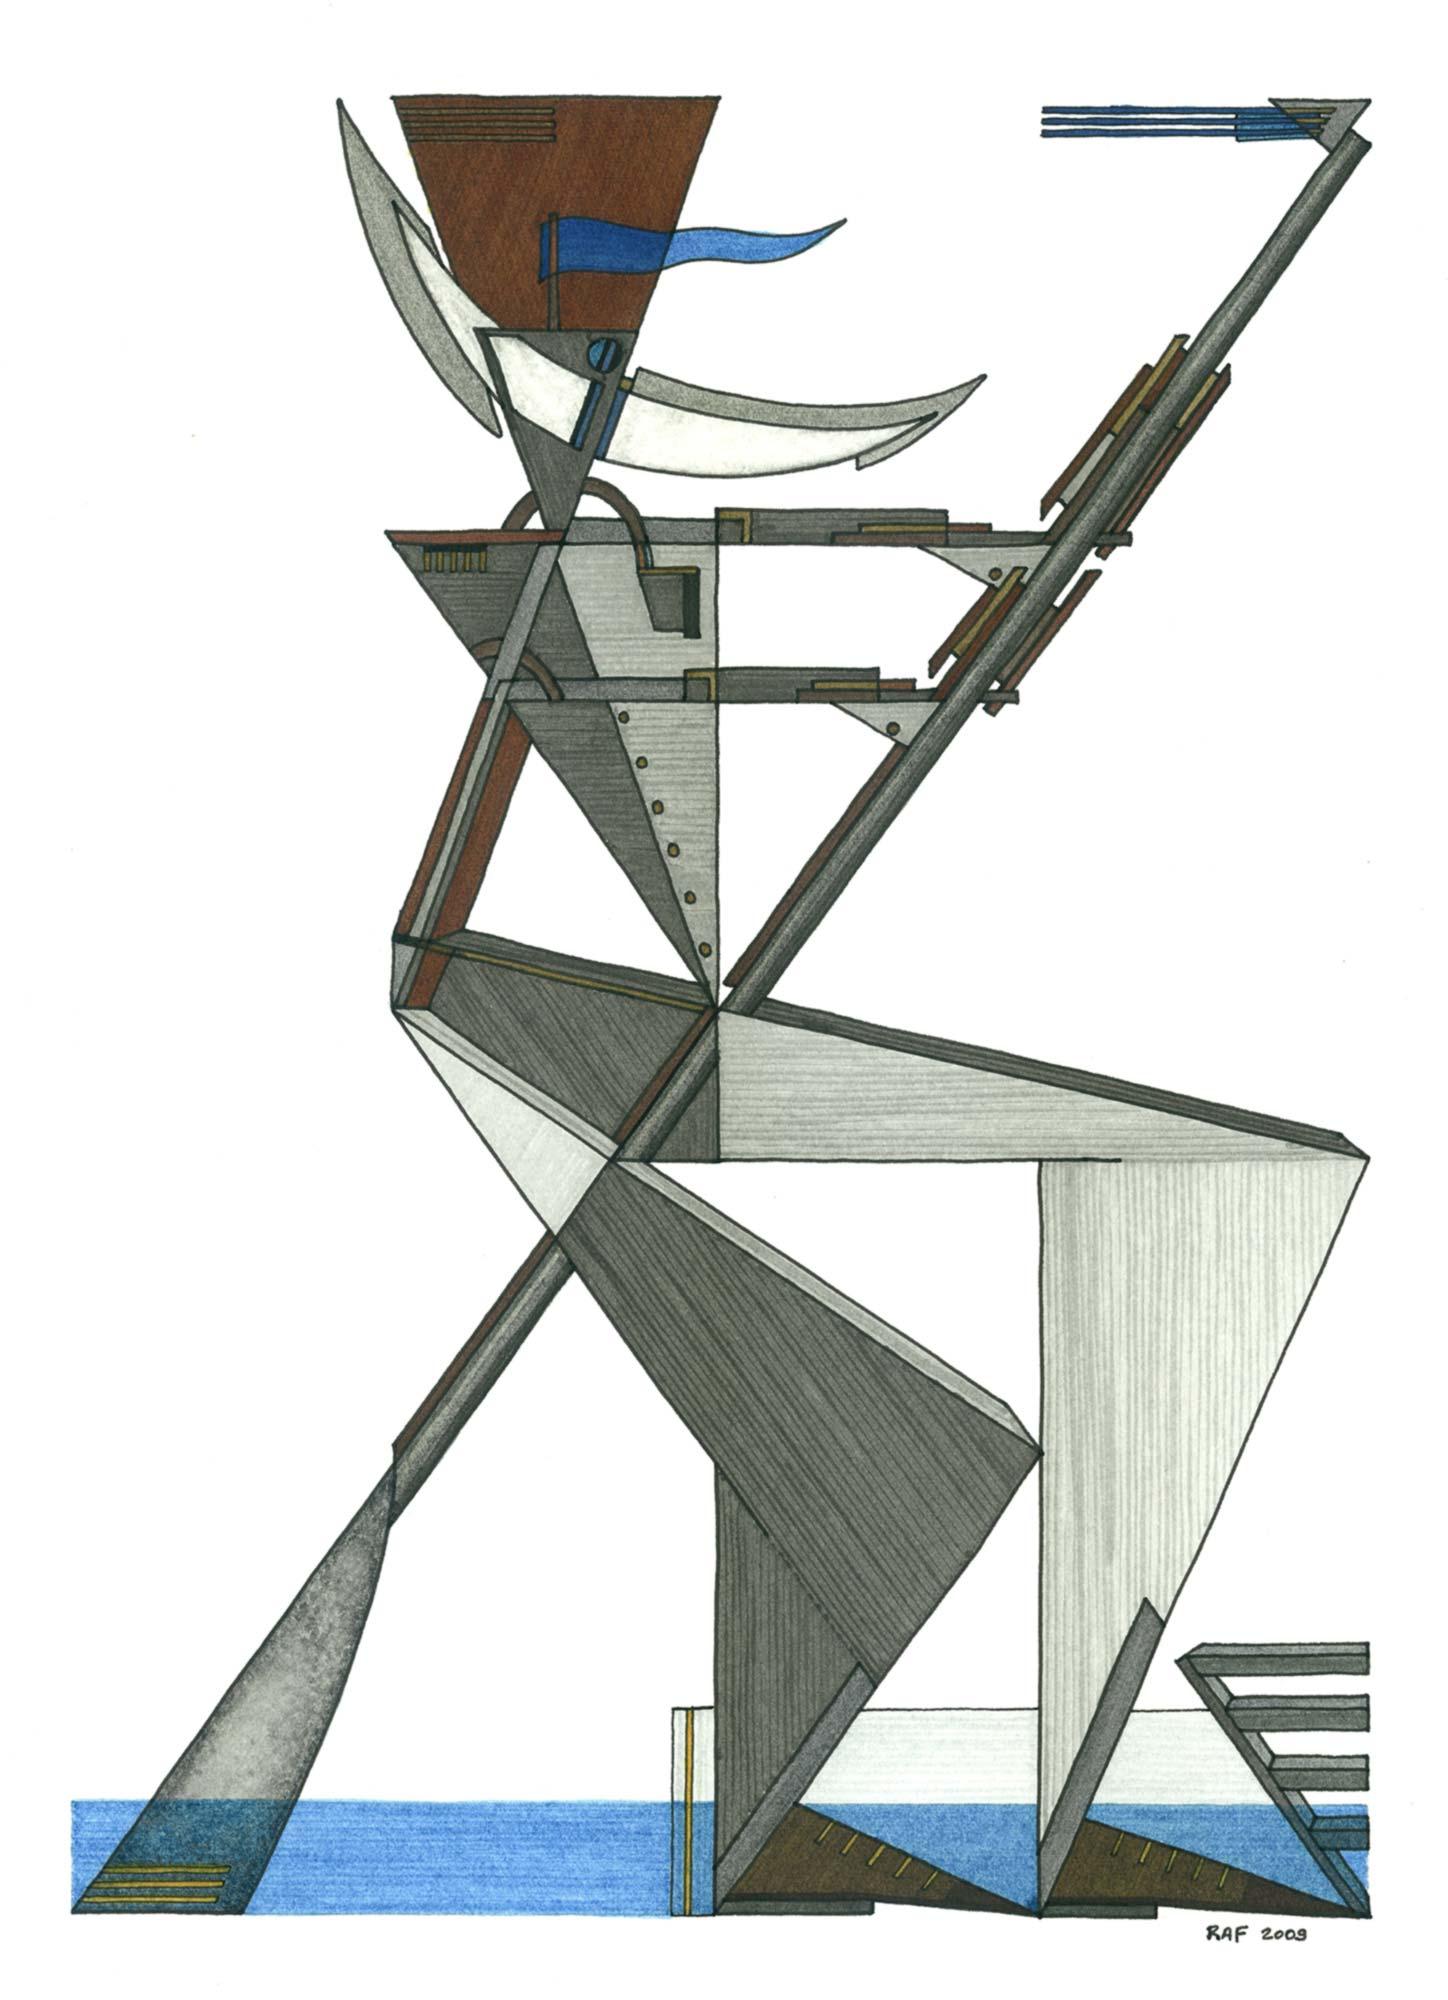 Le rameur, dessin, Raf Listowski, 2009